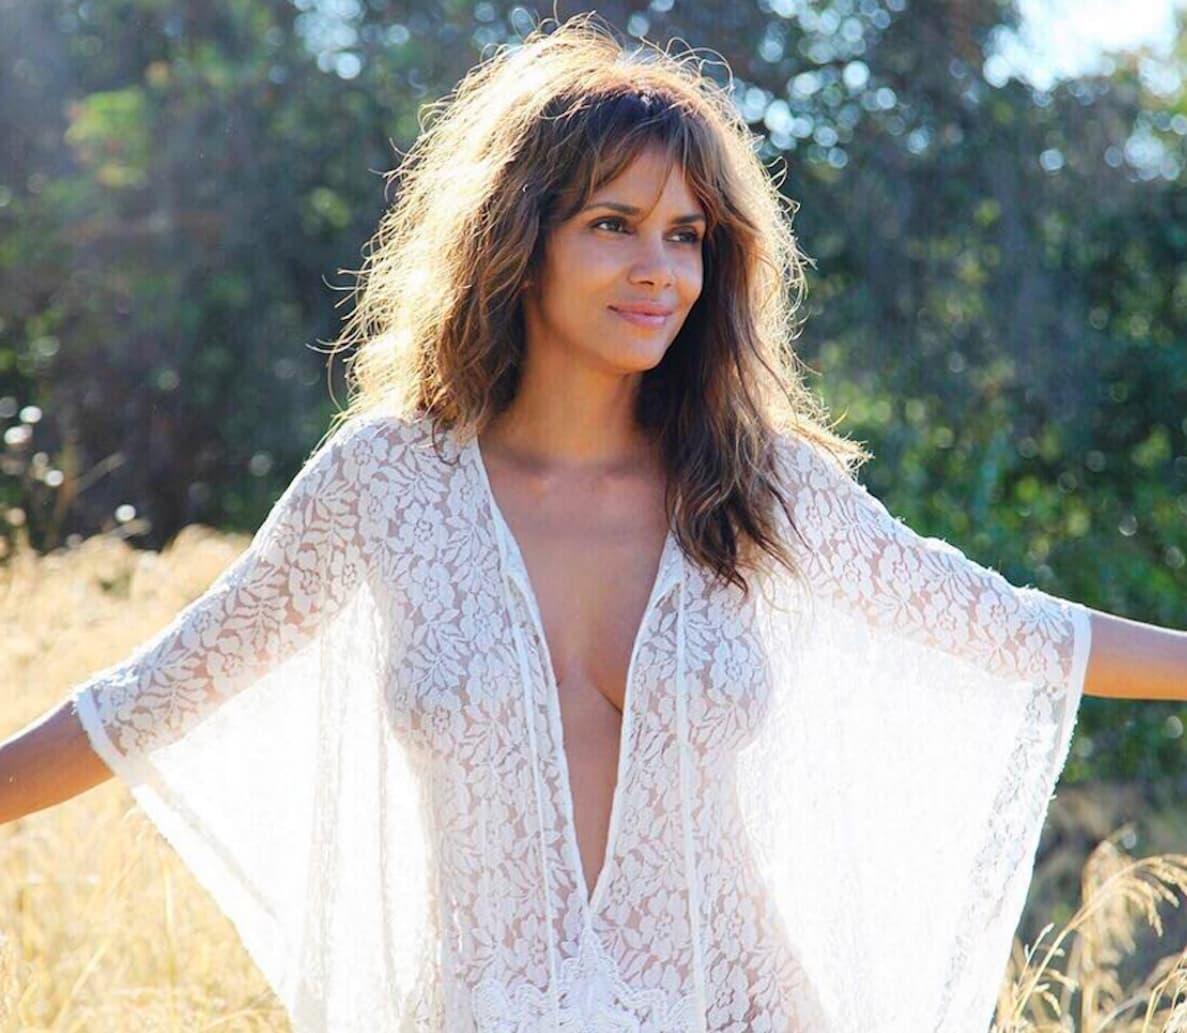 Selfie Halle Berr nude (14 photo), Tits, Paparazzi, Instagram, braless 2018